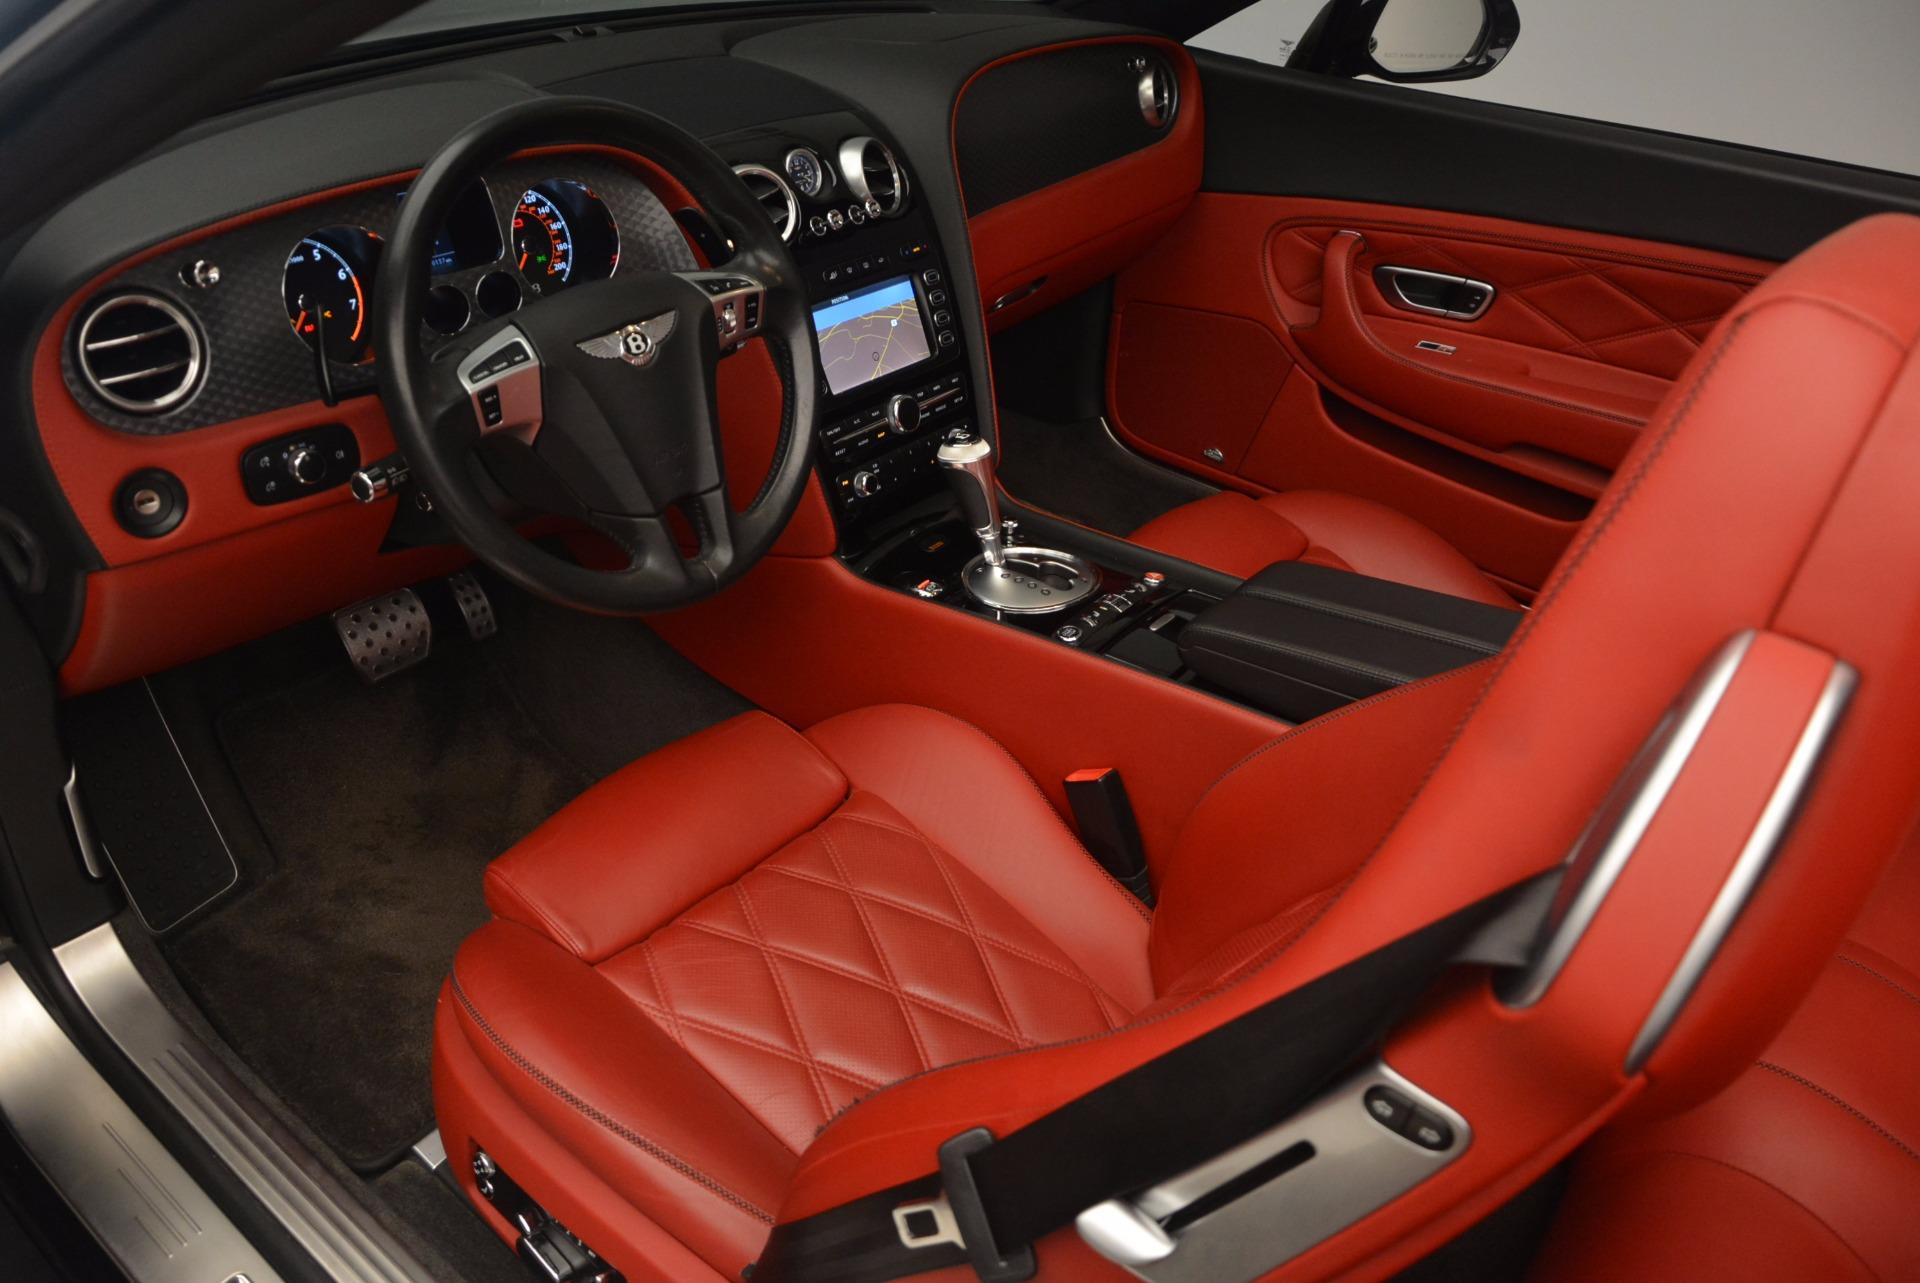 Used 2010 Bentley Continental GT Speed For Sale In Westport, CT 1298_p34